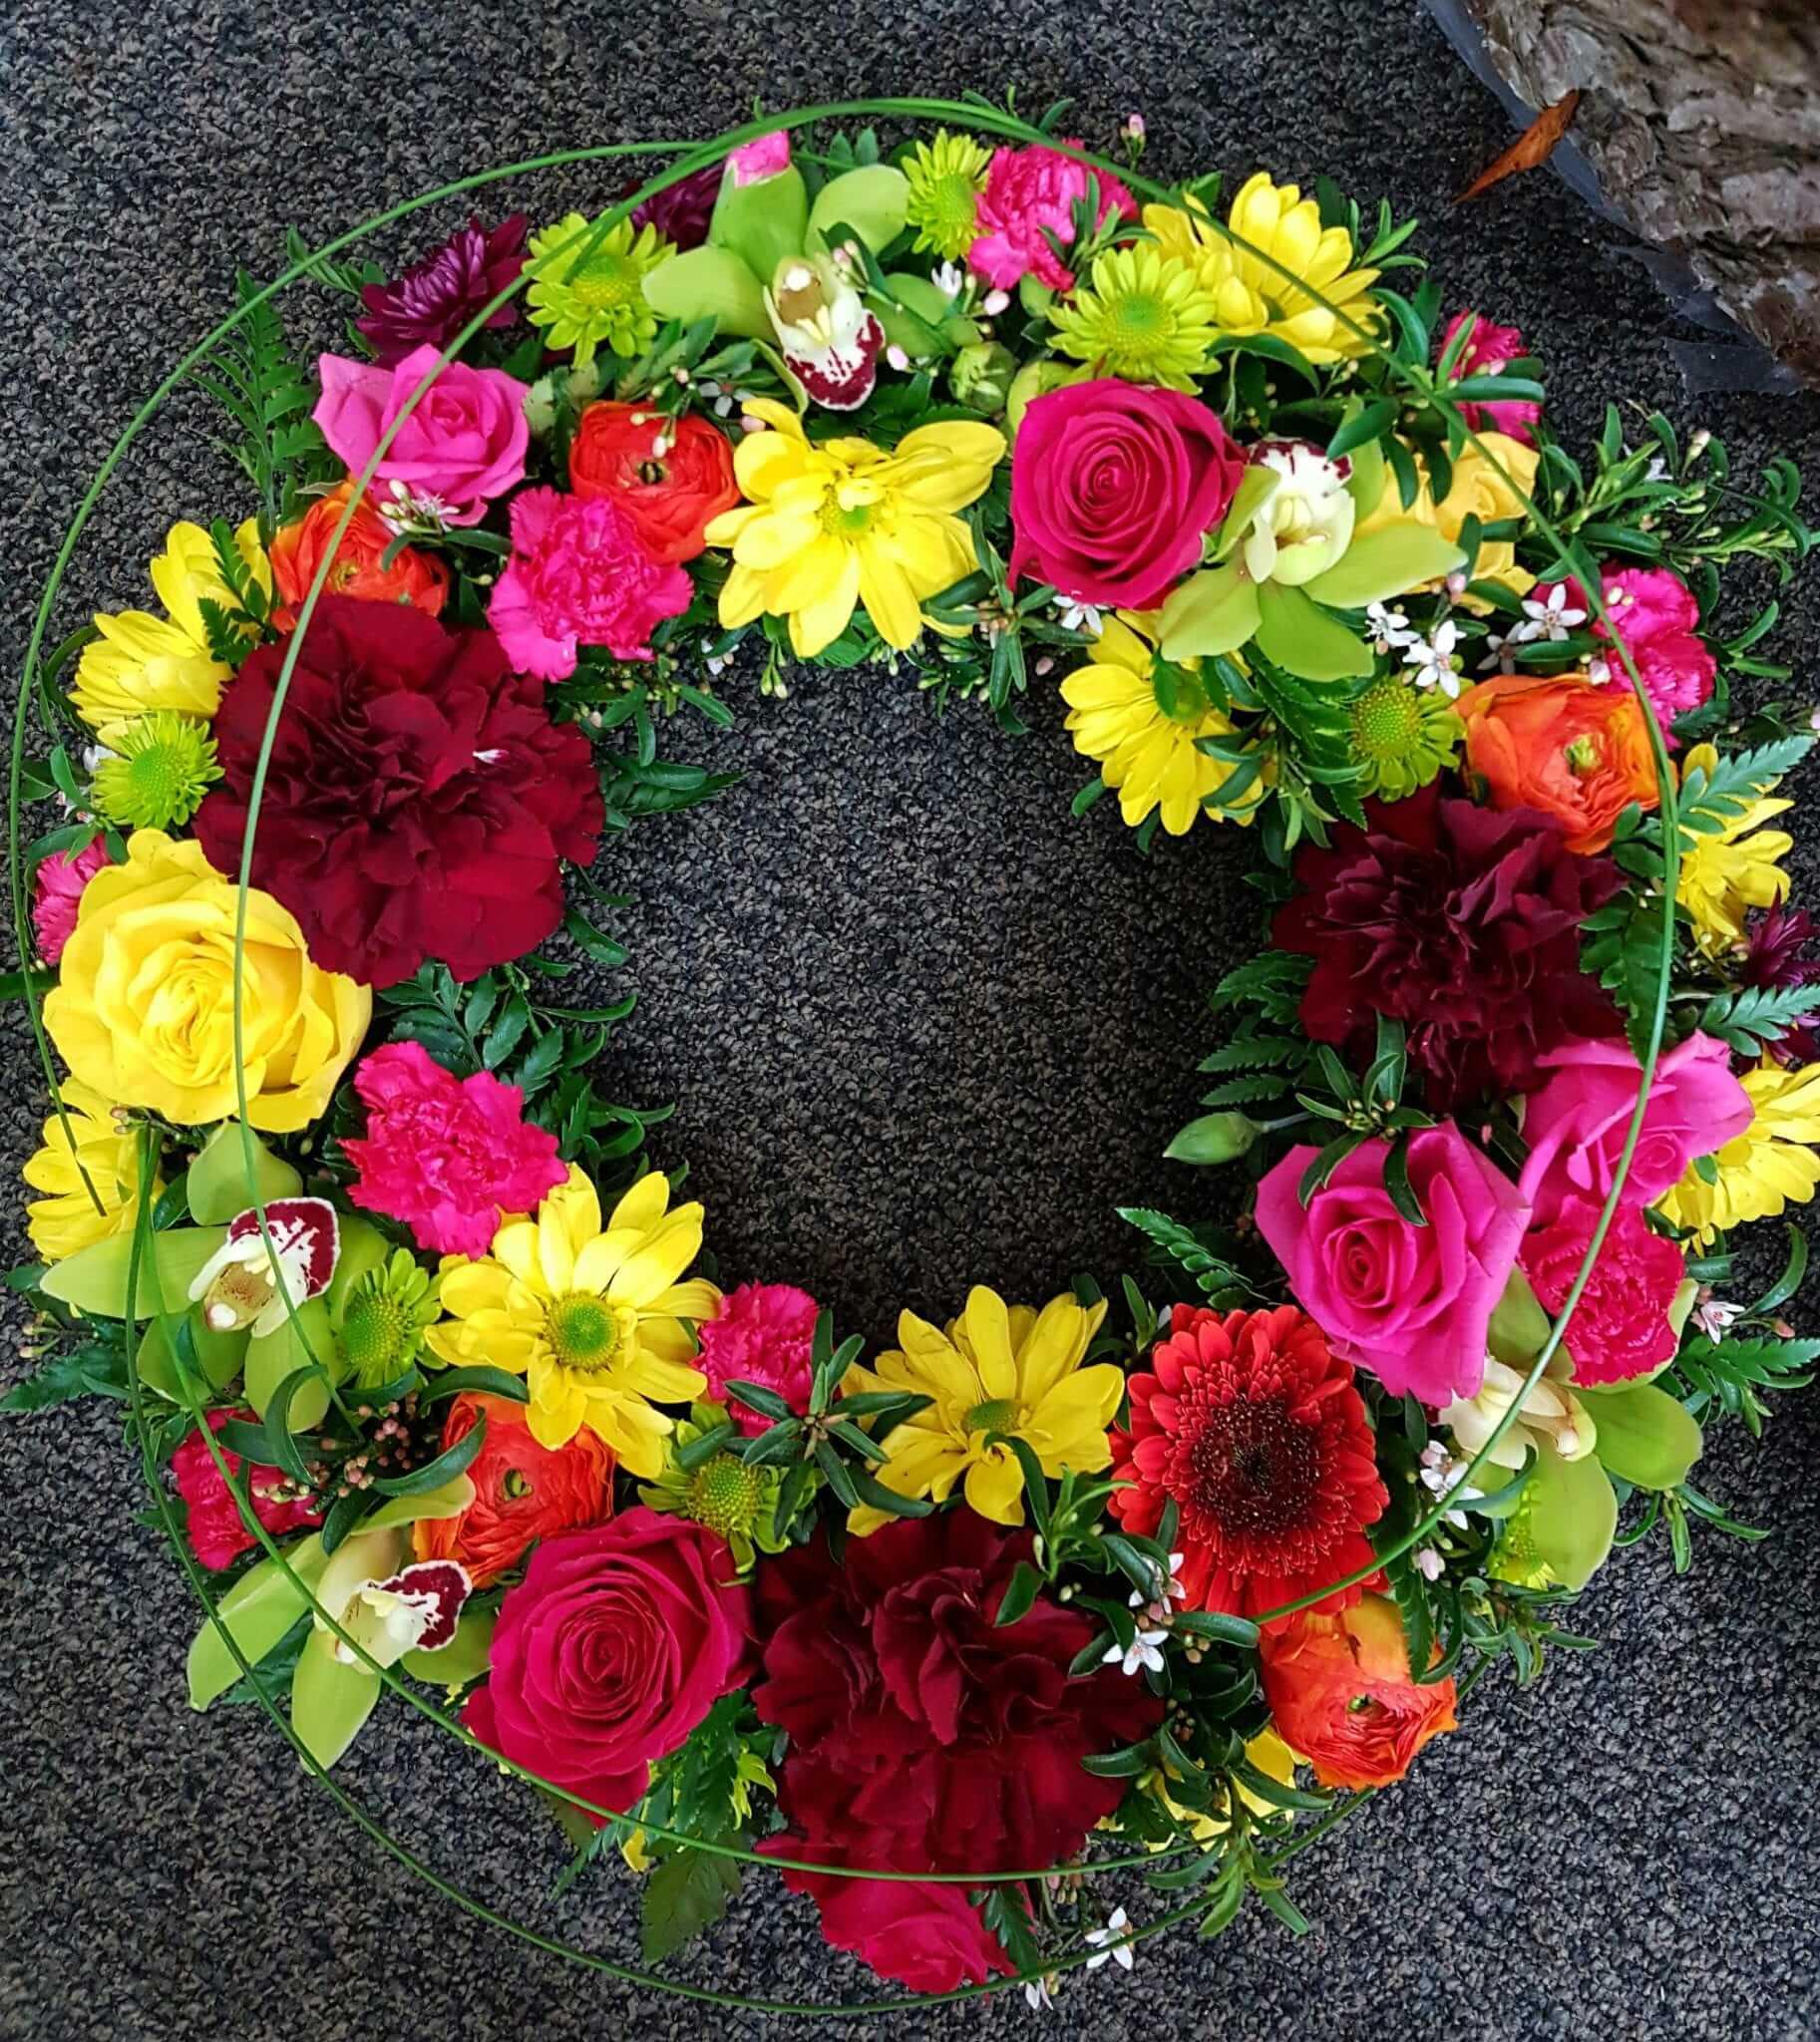 Floral wreath cherrywood florist tauranga homesympathyfloral wreath previous izmirmasajfo